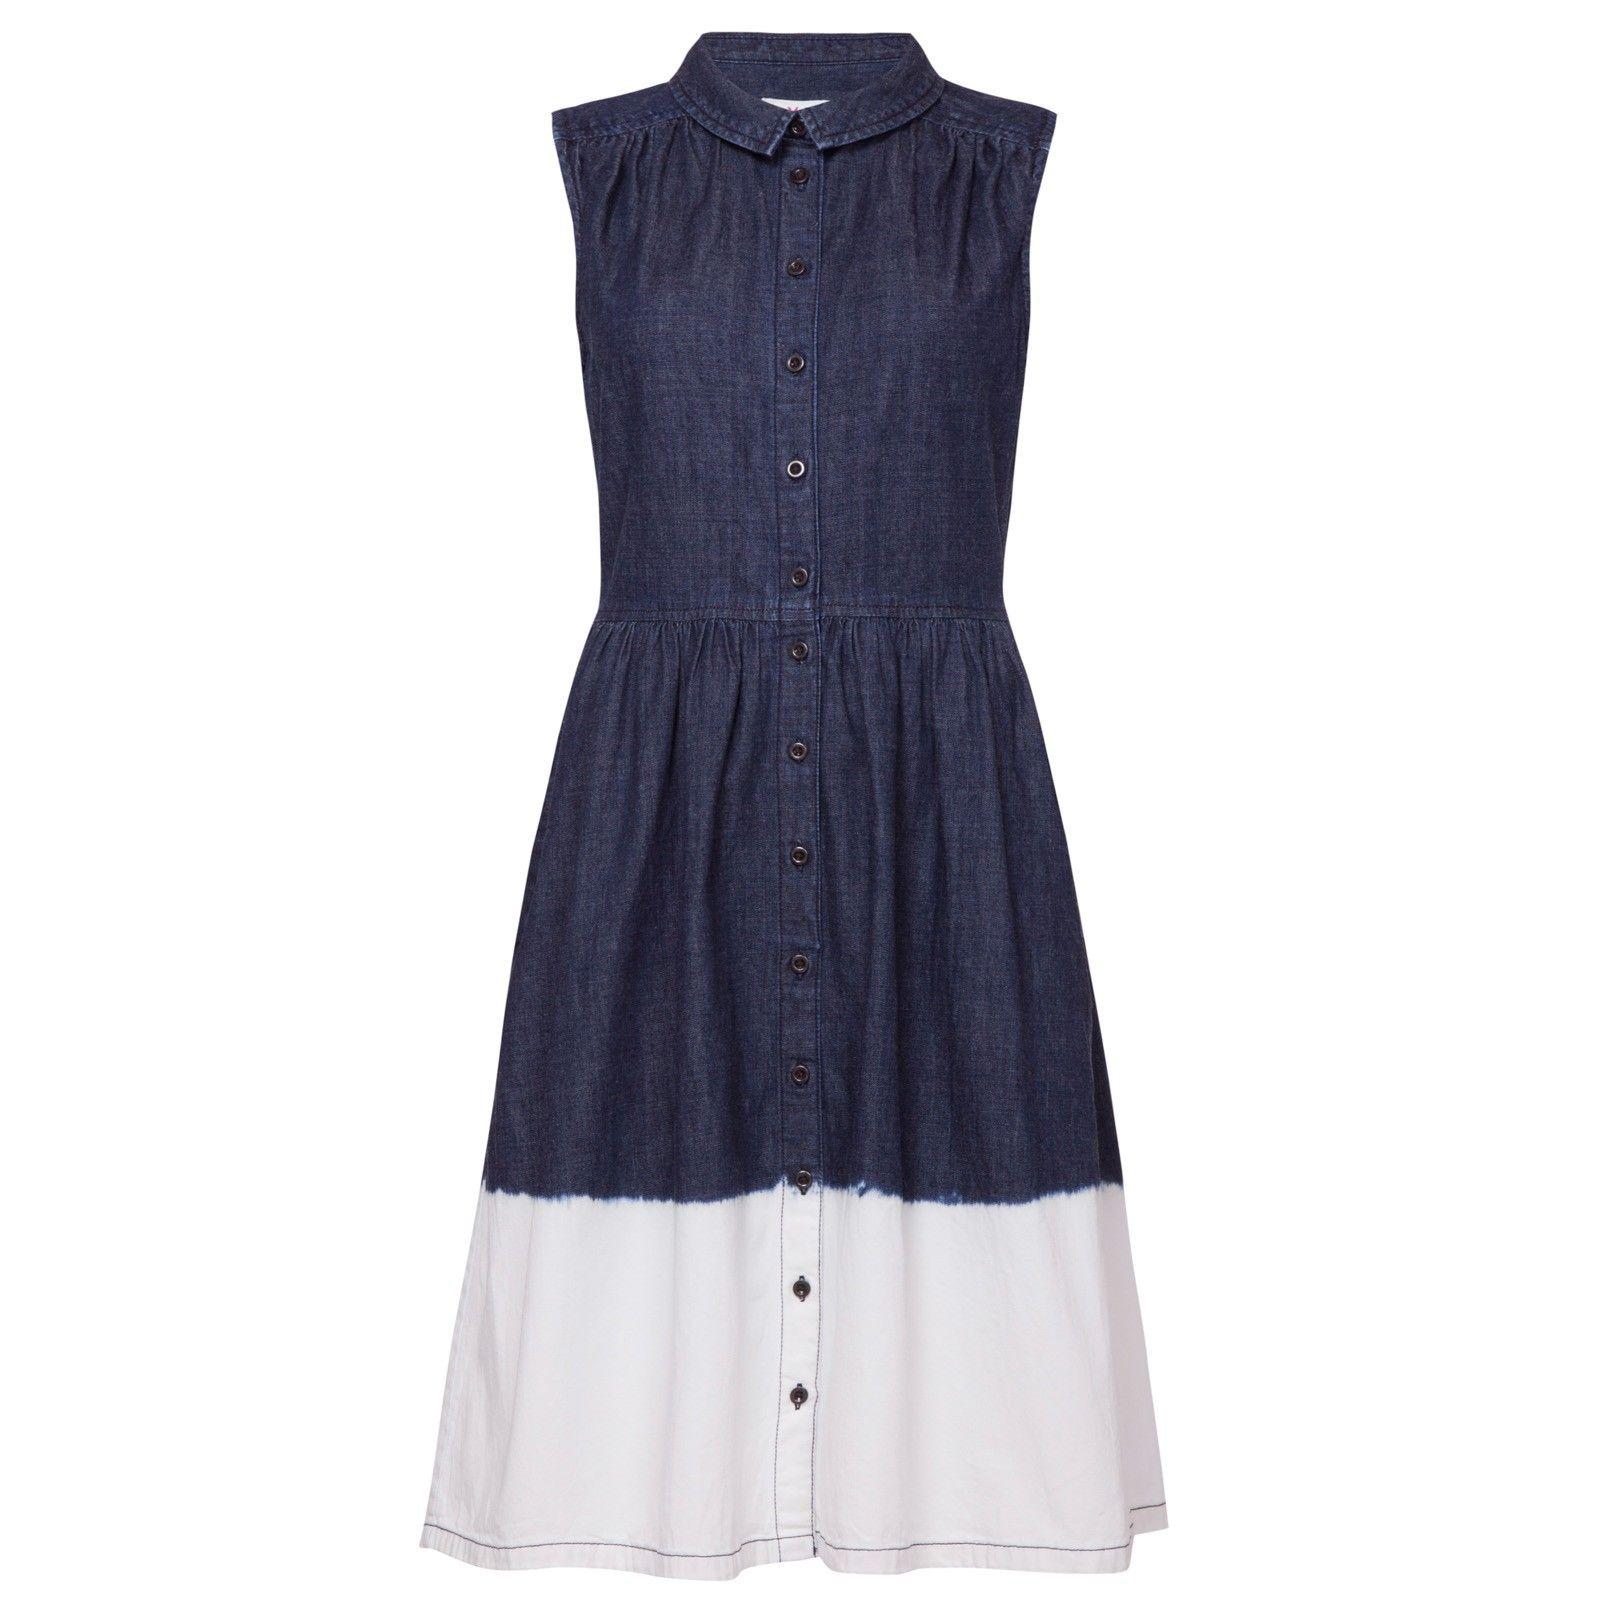 Watch YMC DYE Clothing Line video